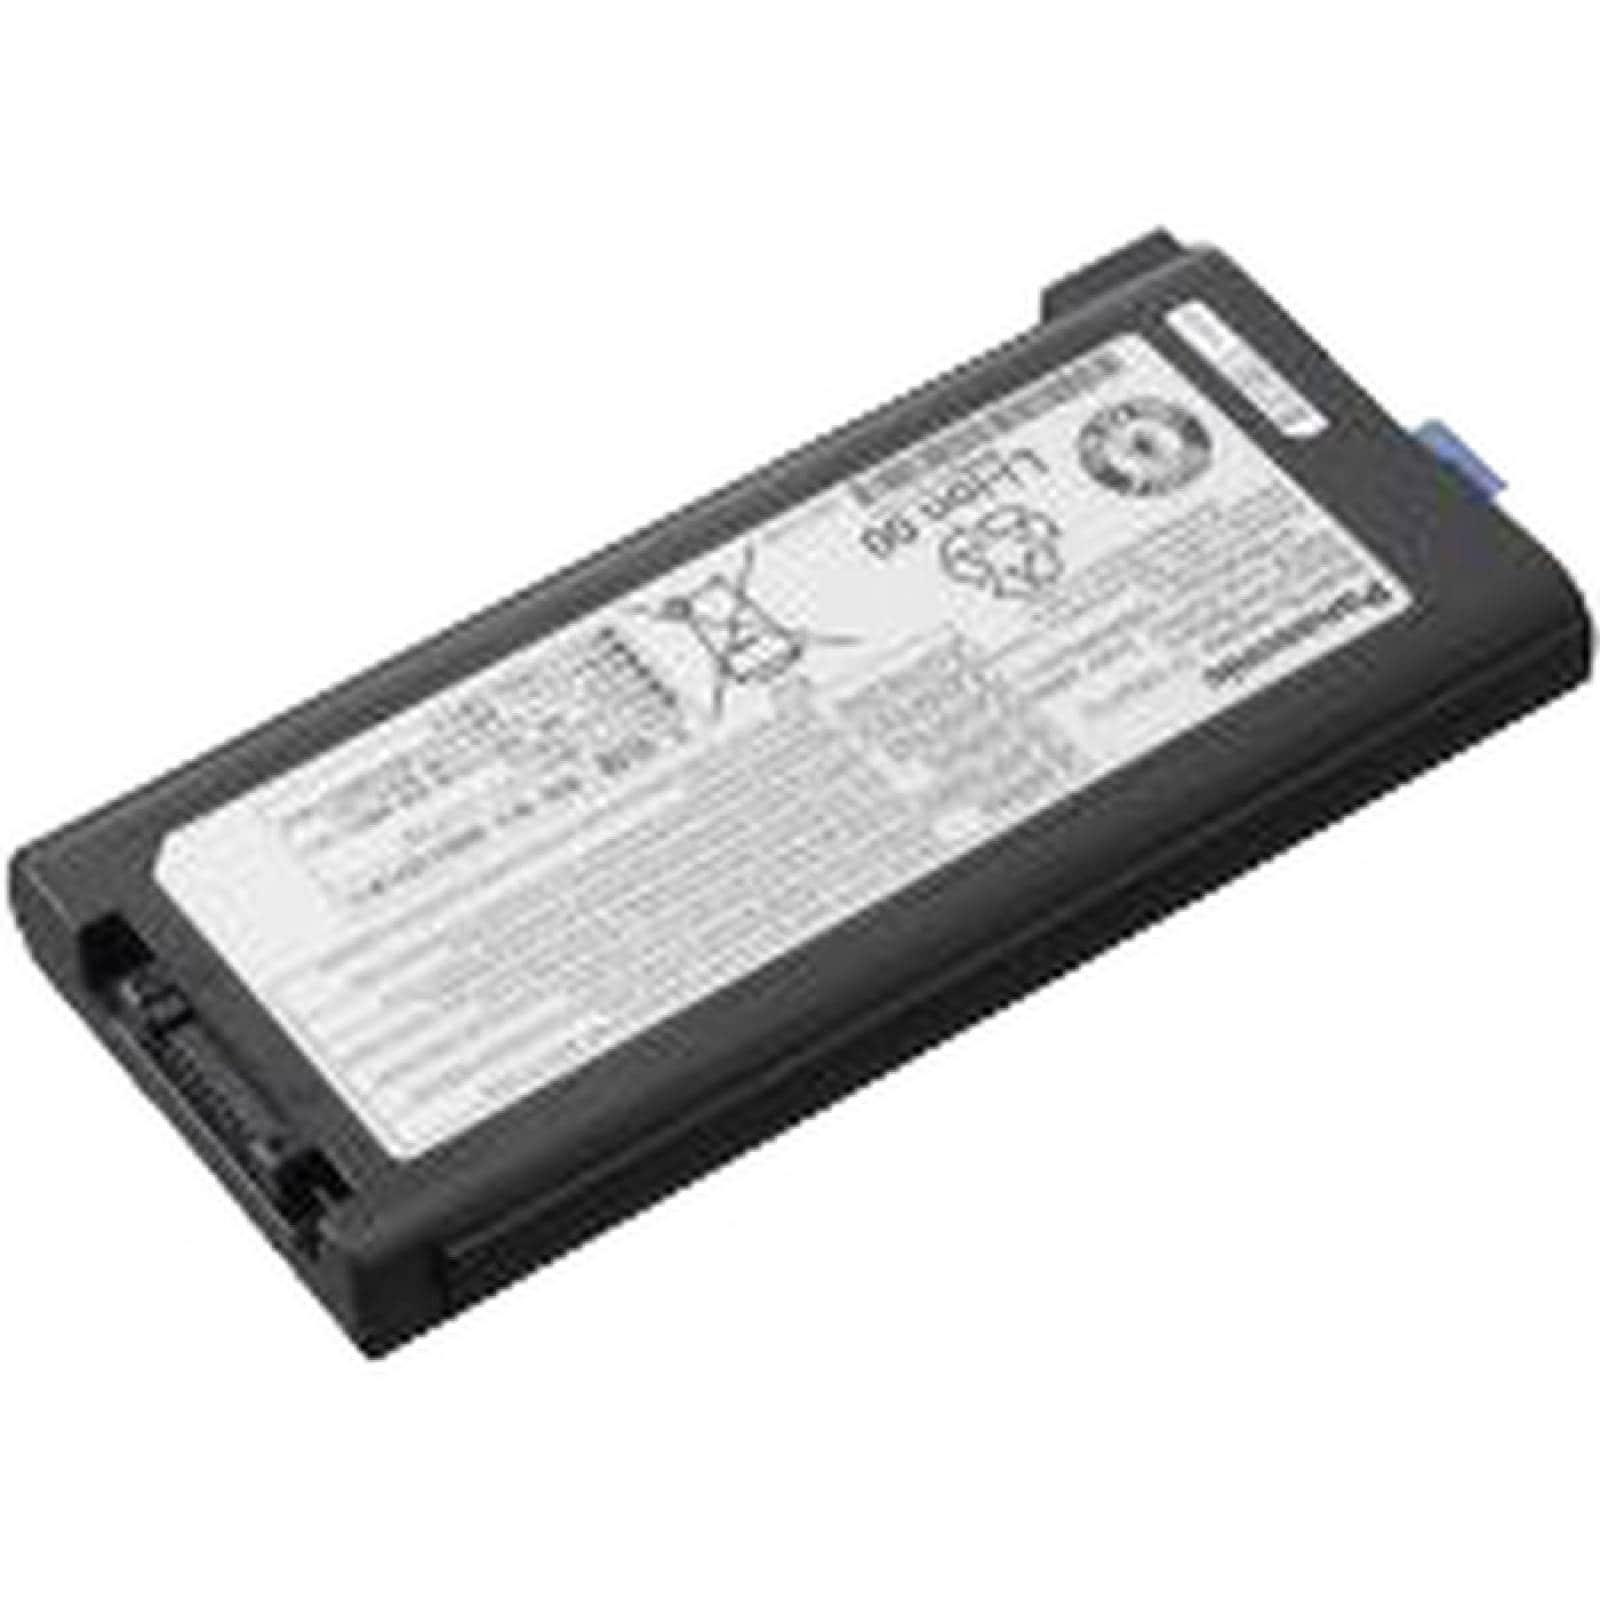 Batera para porttil Panasonic CFVZSU72U